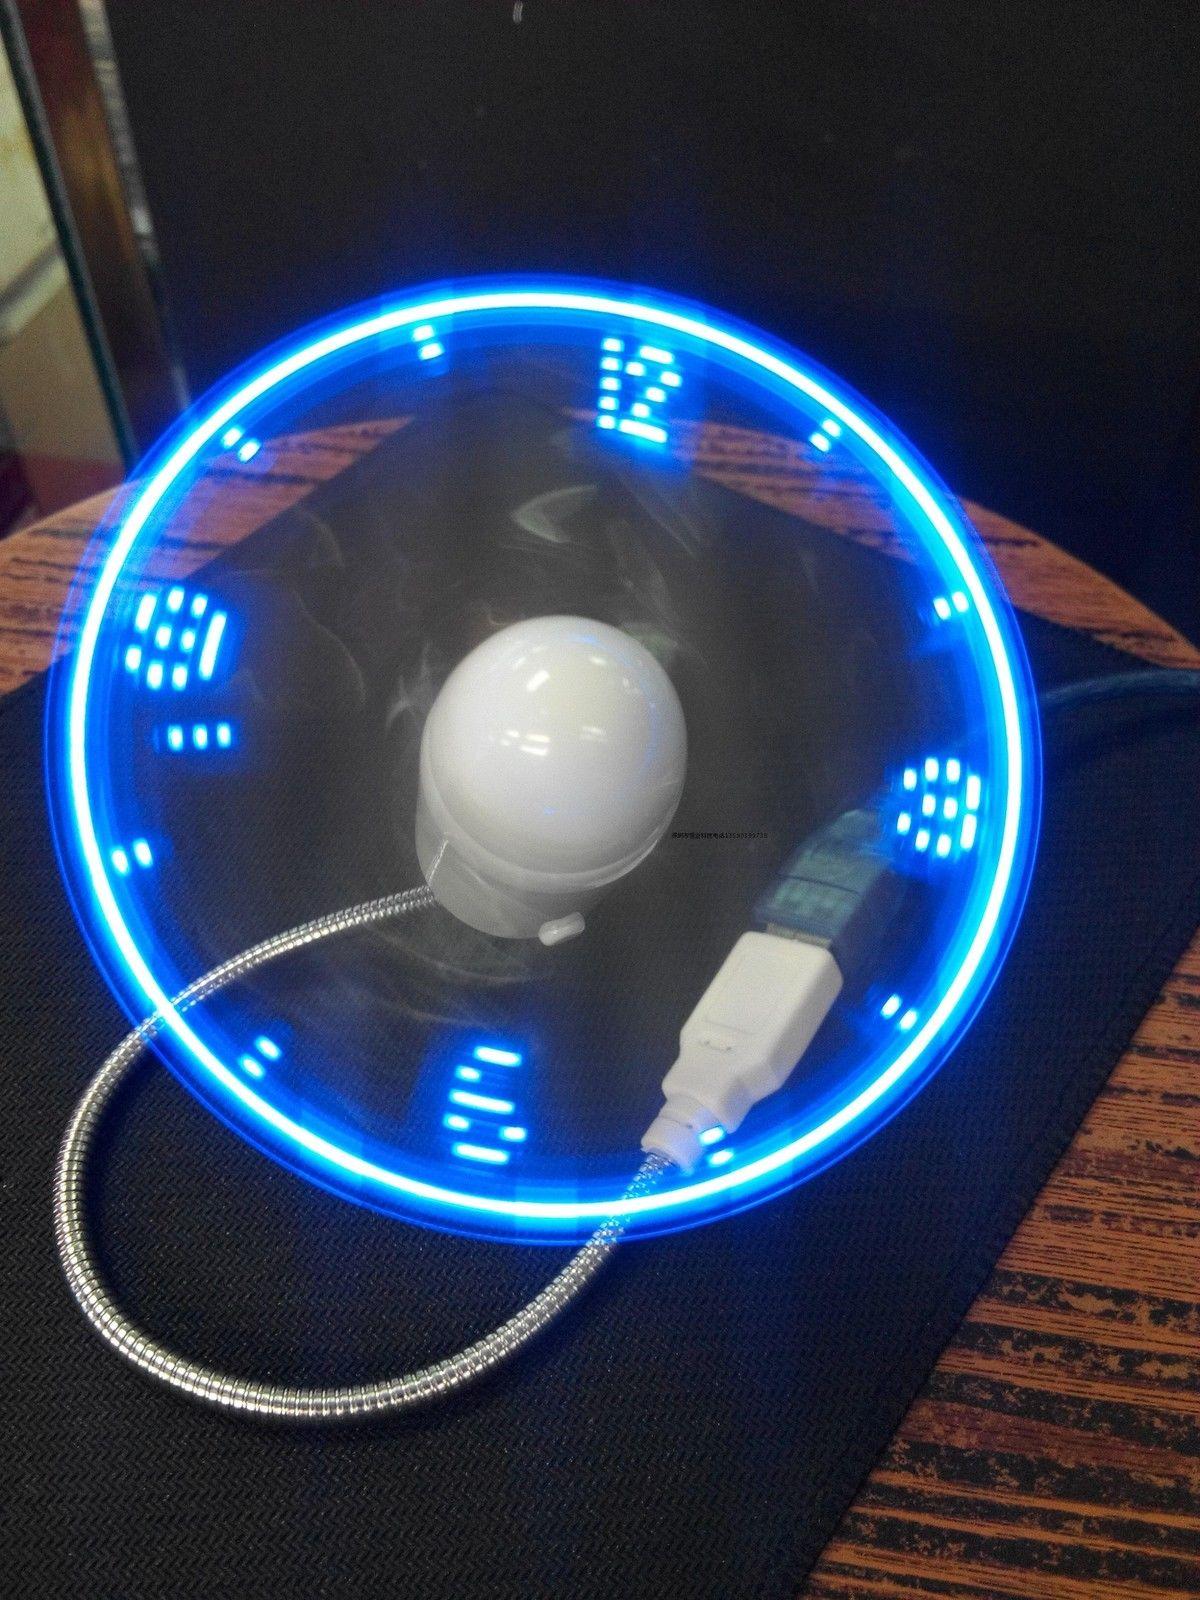 JETTING Durable Adjustable USB Gadget Mini Flexible LED Light USB Fan Time Clock Desktop Clock Gadget Time Display 1pcs